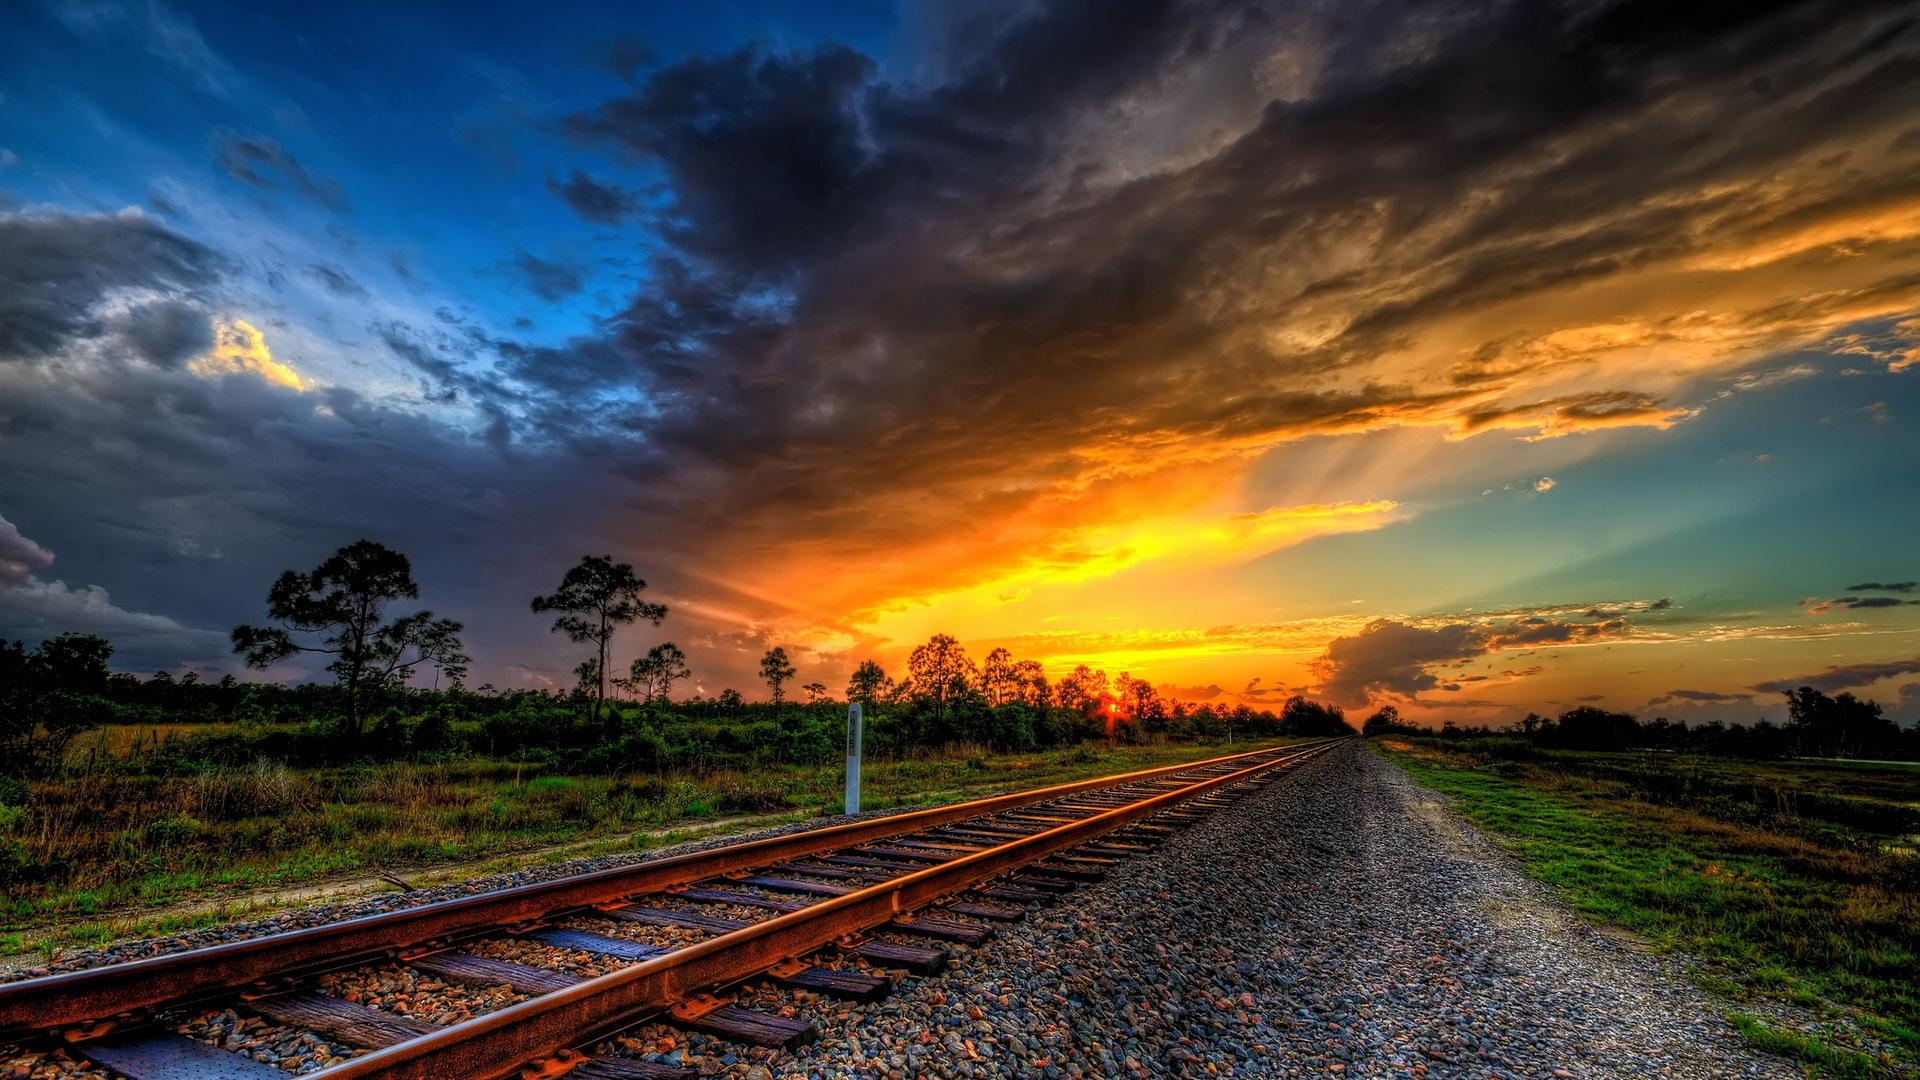 Wonderful Sunset On Train Tracks Hdr HD Desktop Background 1920x1080